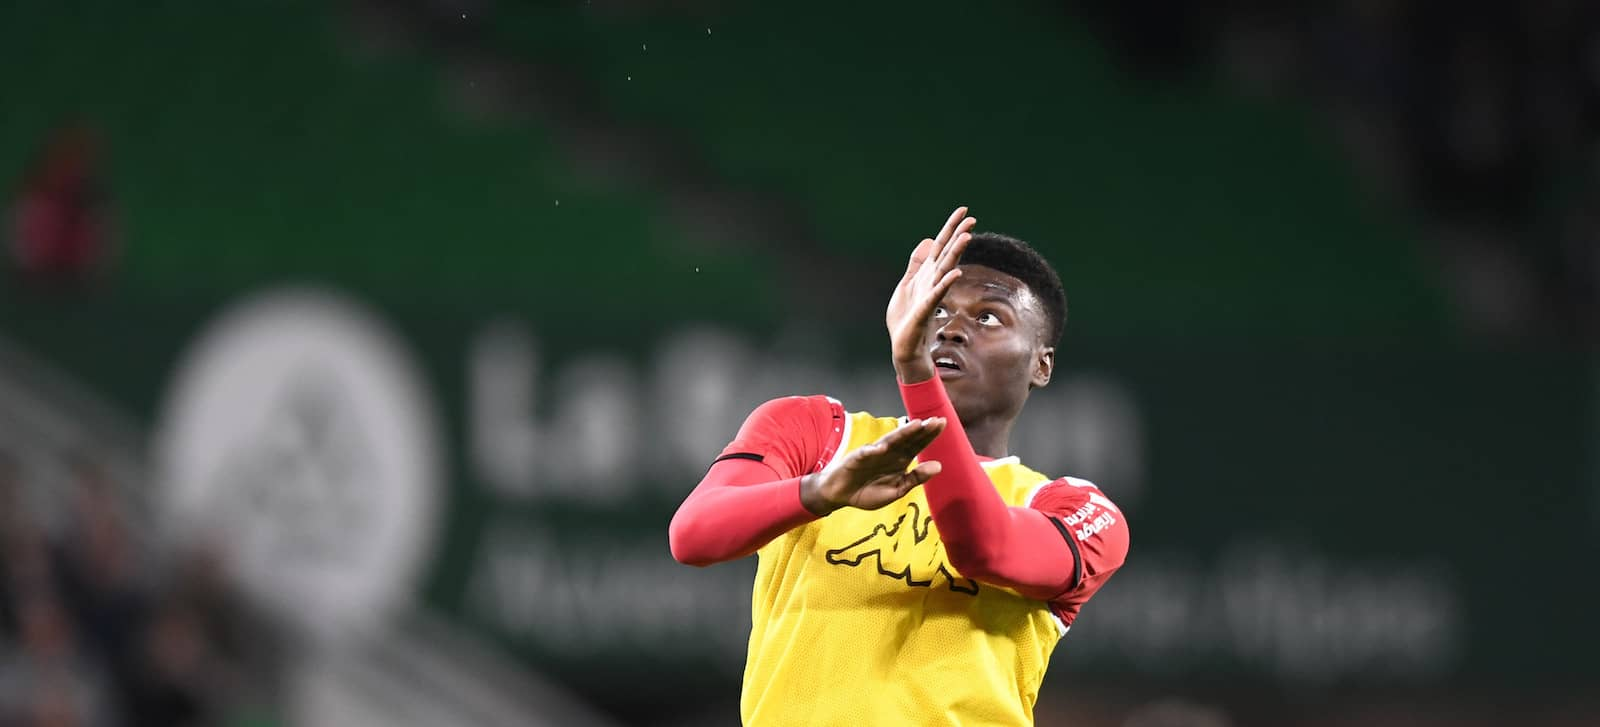 AS Monaco reject Manchester United's bid for Benoit Badiashile